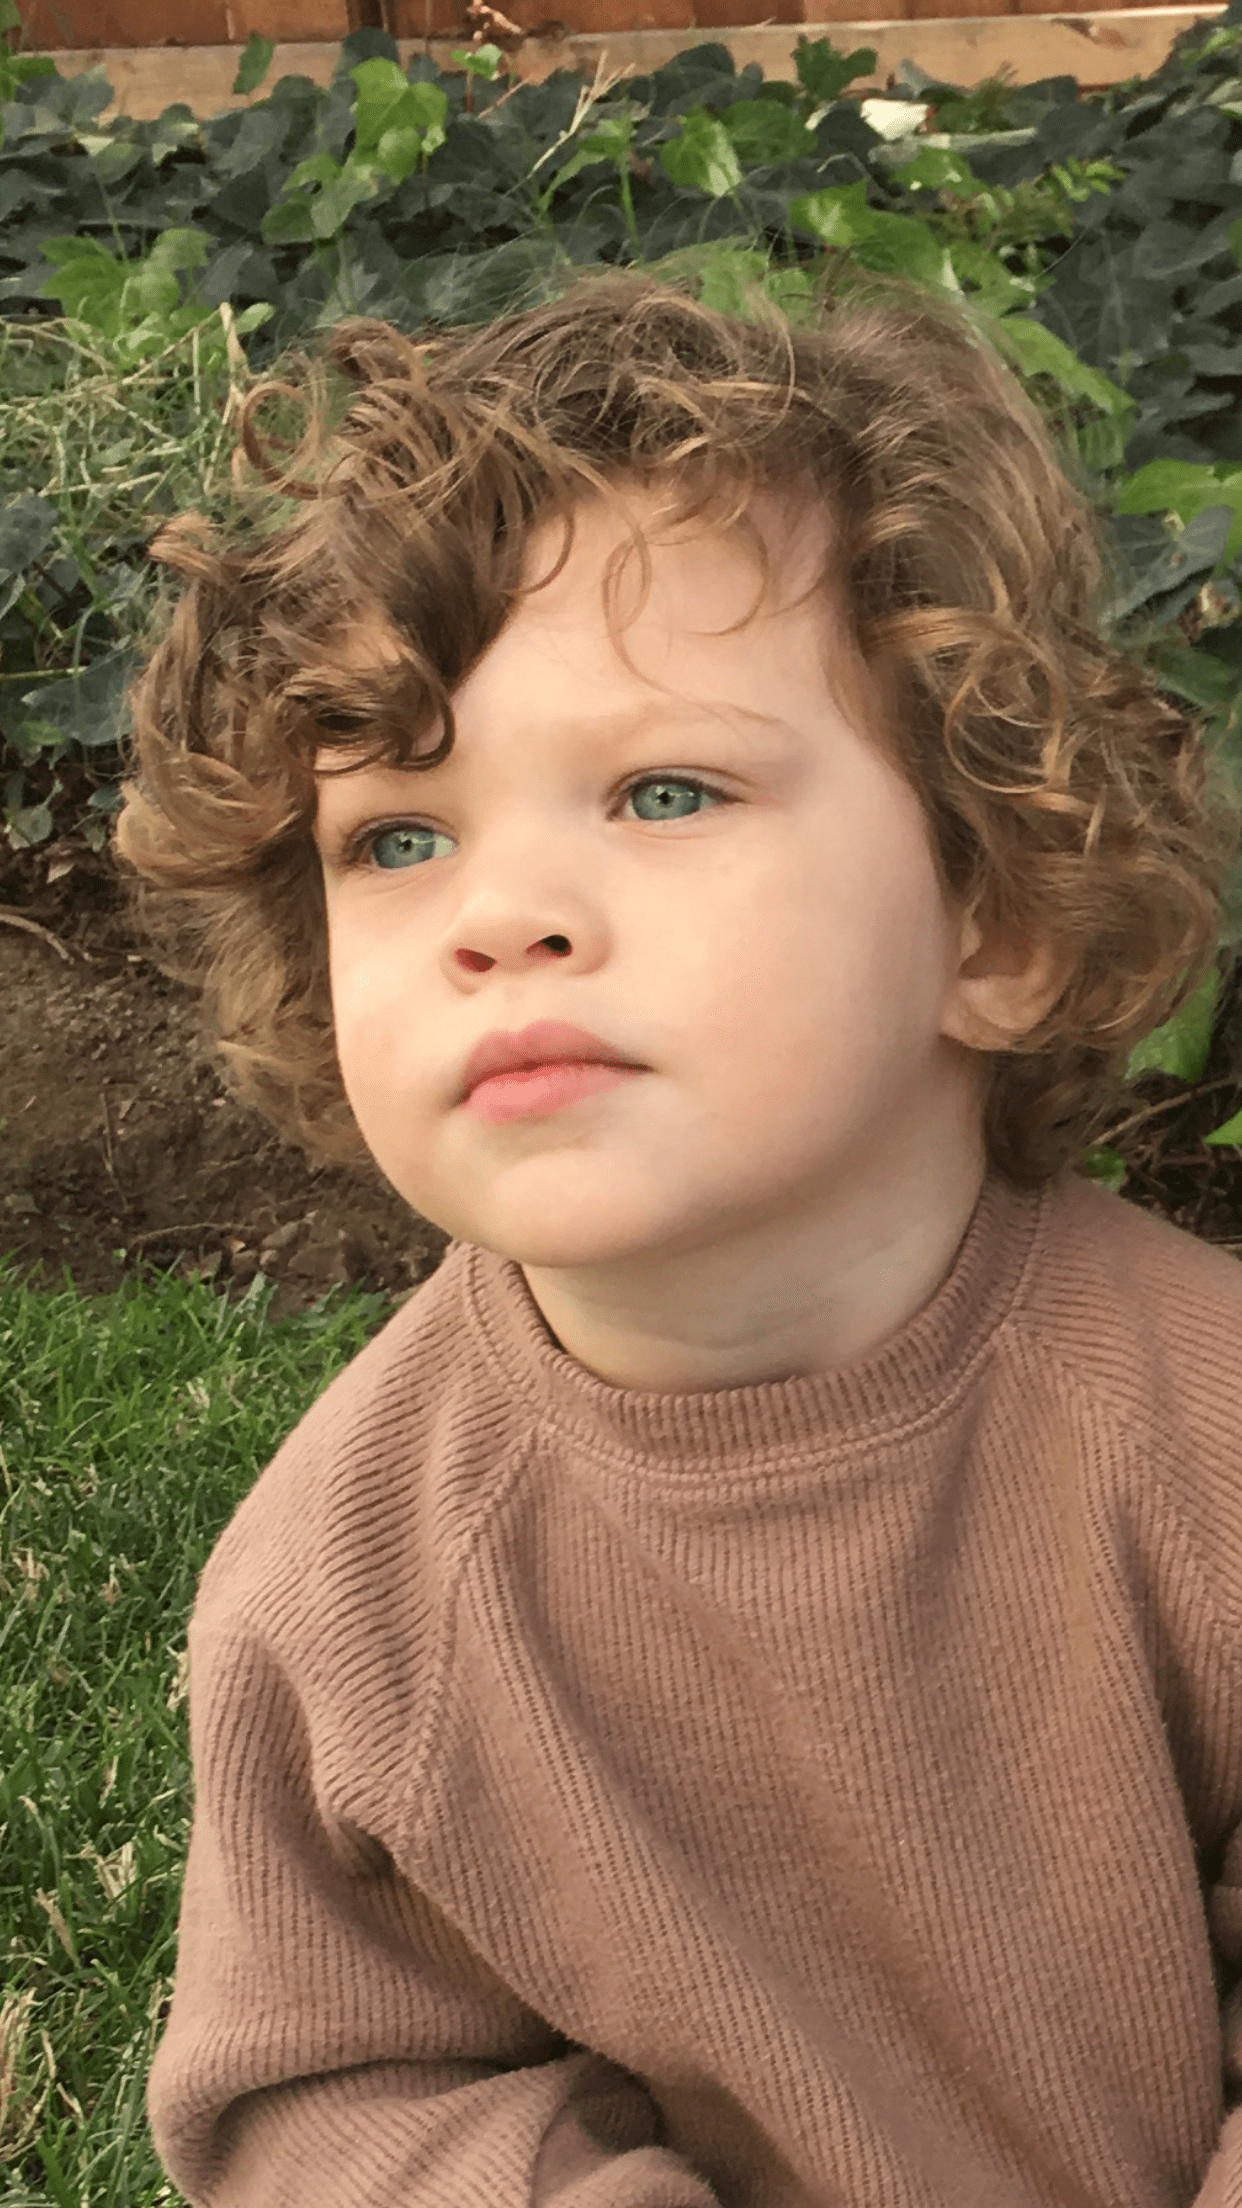 Curly Hairstyles Baby Boy Oglan Cocugu Sac Modelleri Erkek